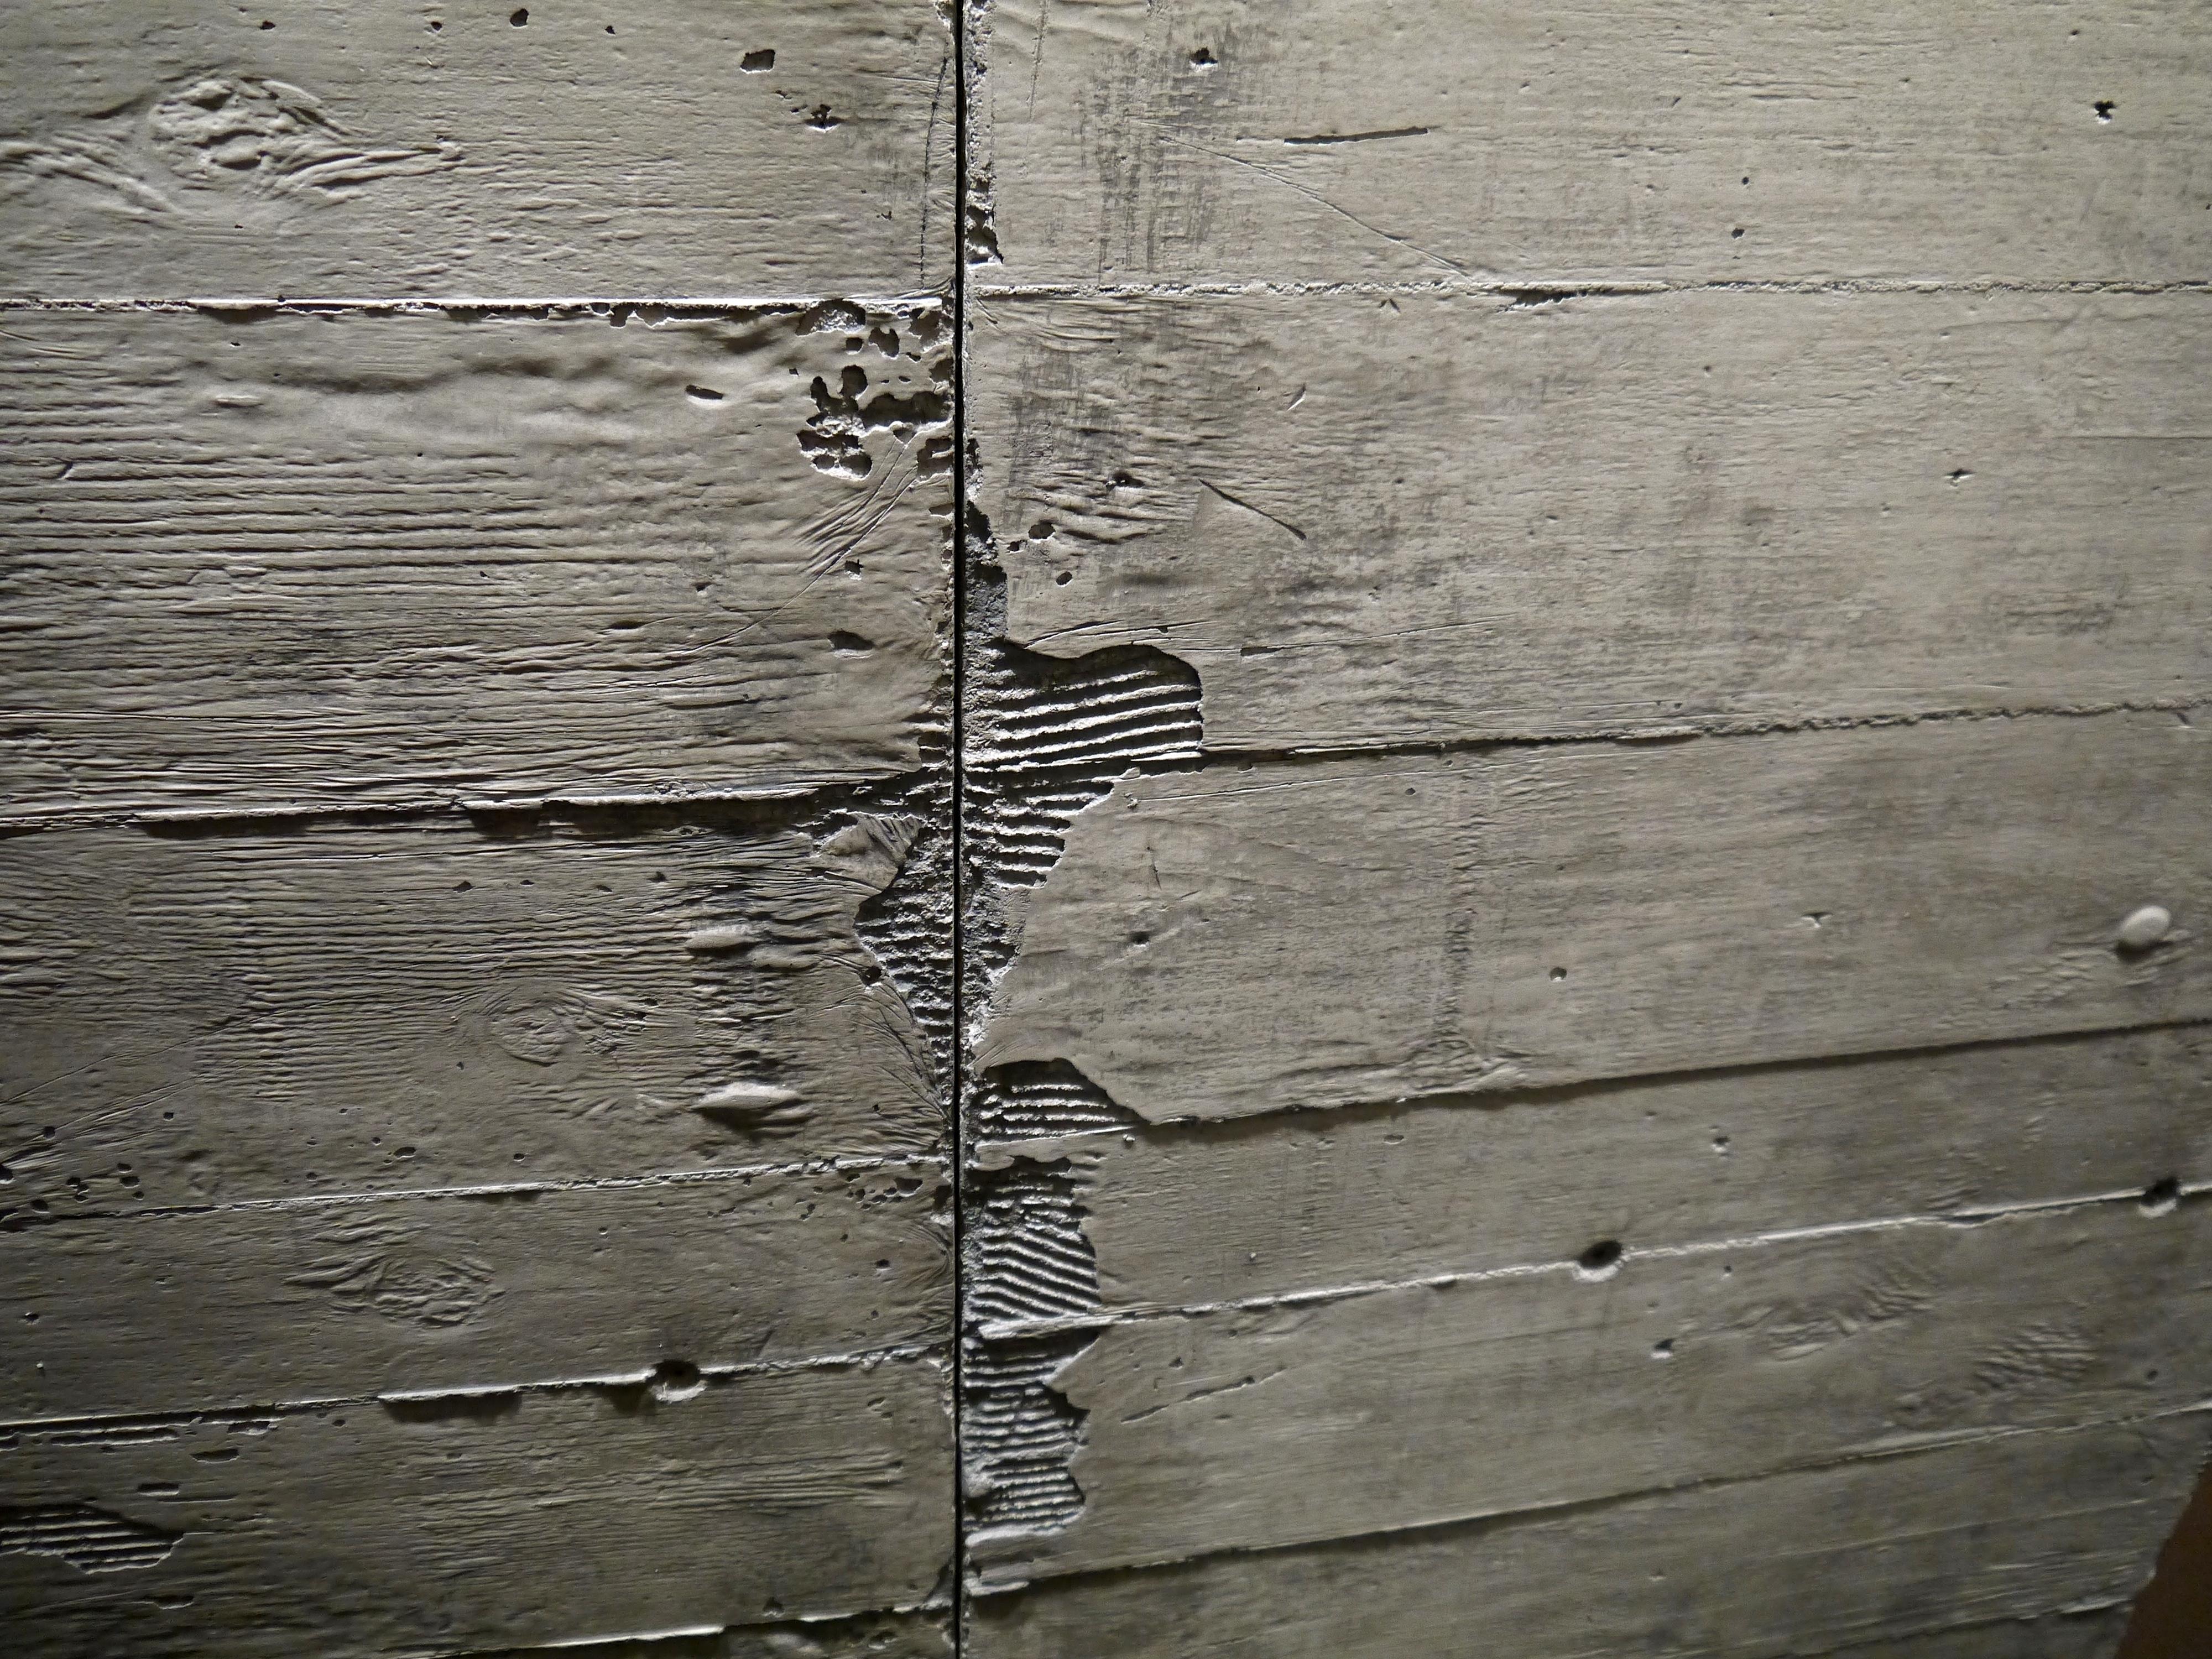 Concrete Look Wallpaper & 4000x3000px Concrete Look Wallpaper - WallpaperSafari